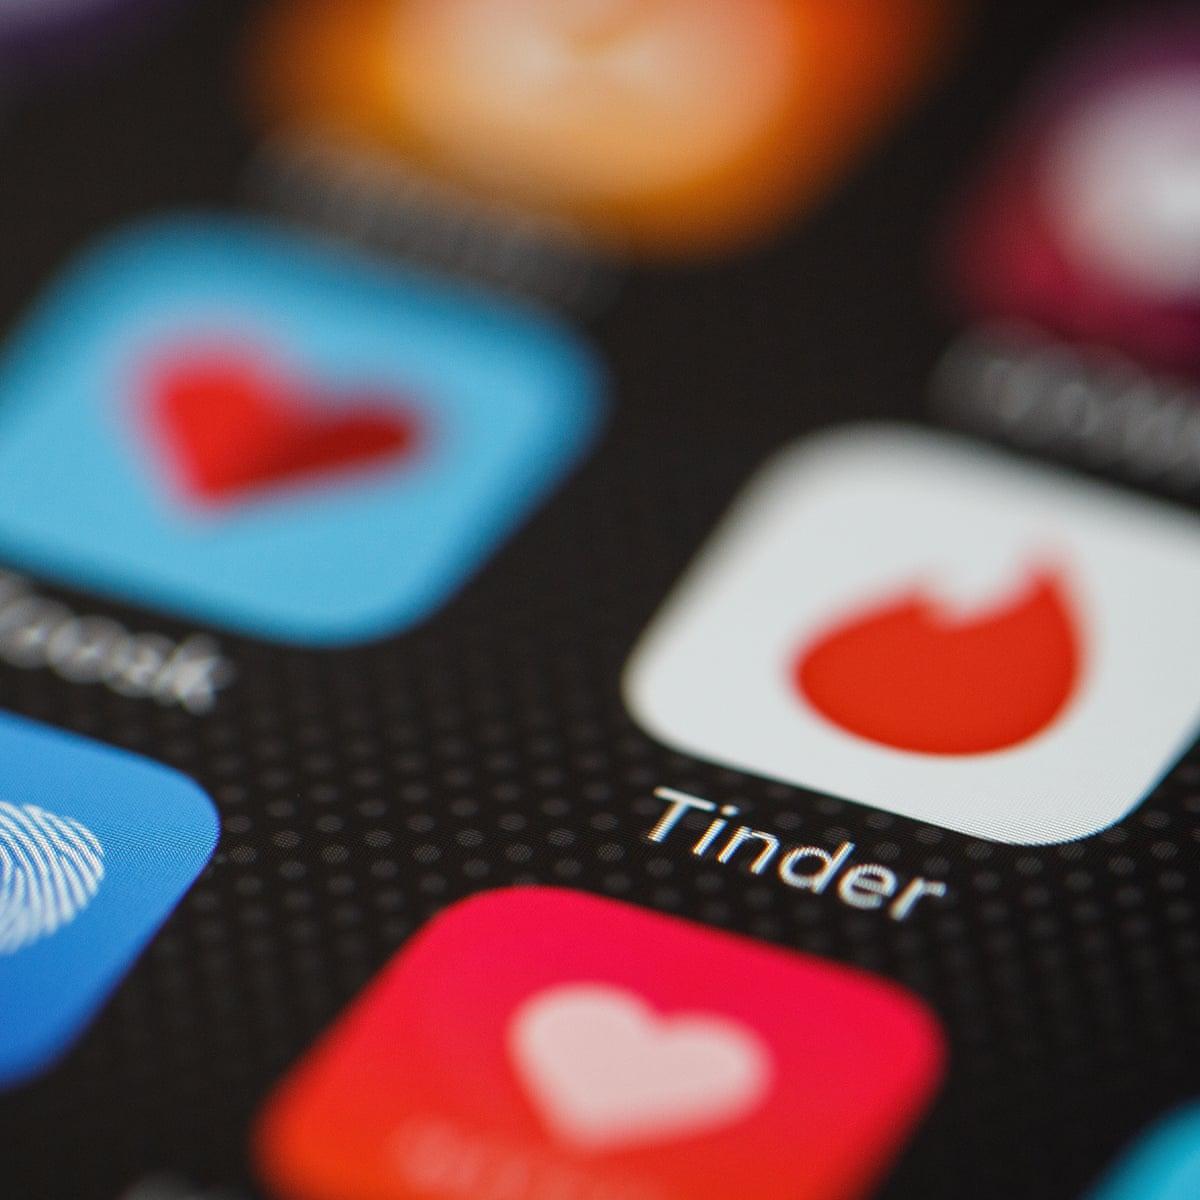 Pua internet dating profile yenta dating app